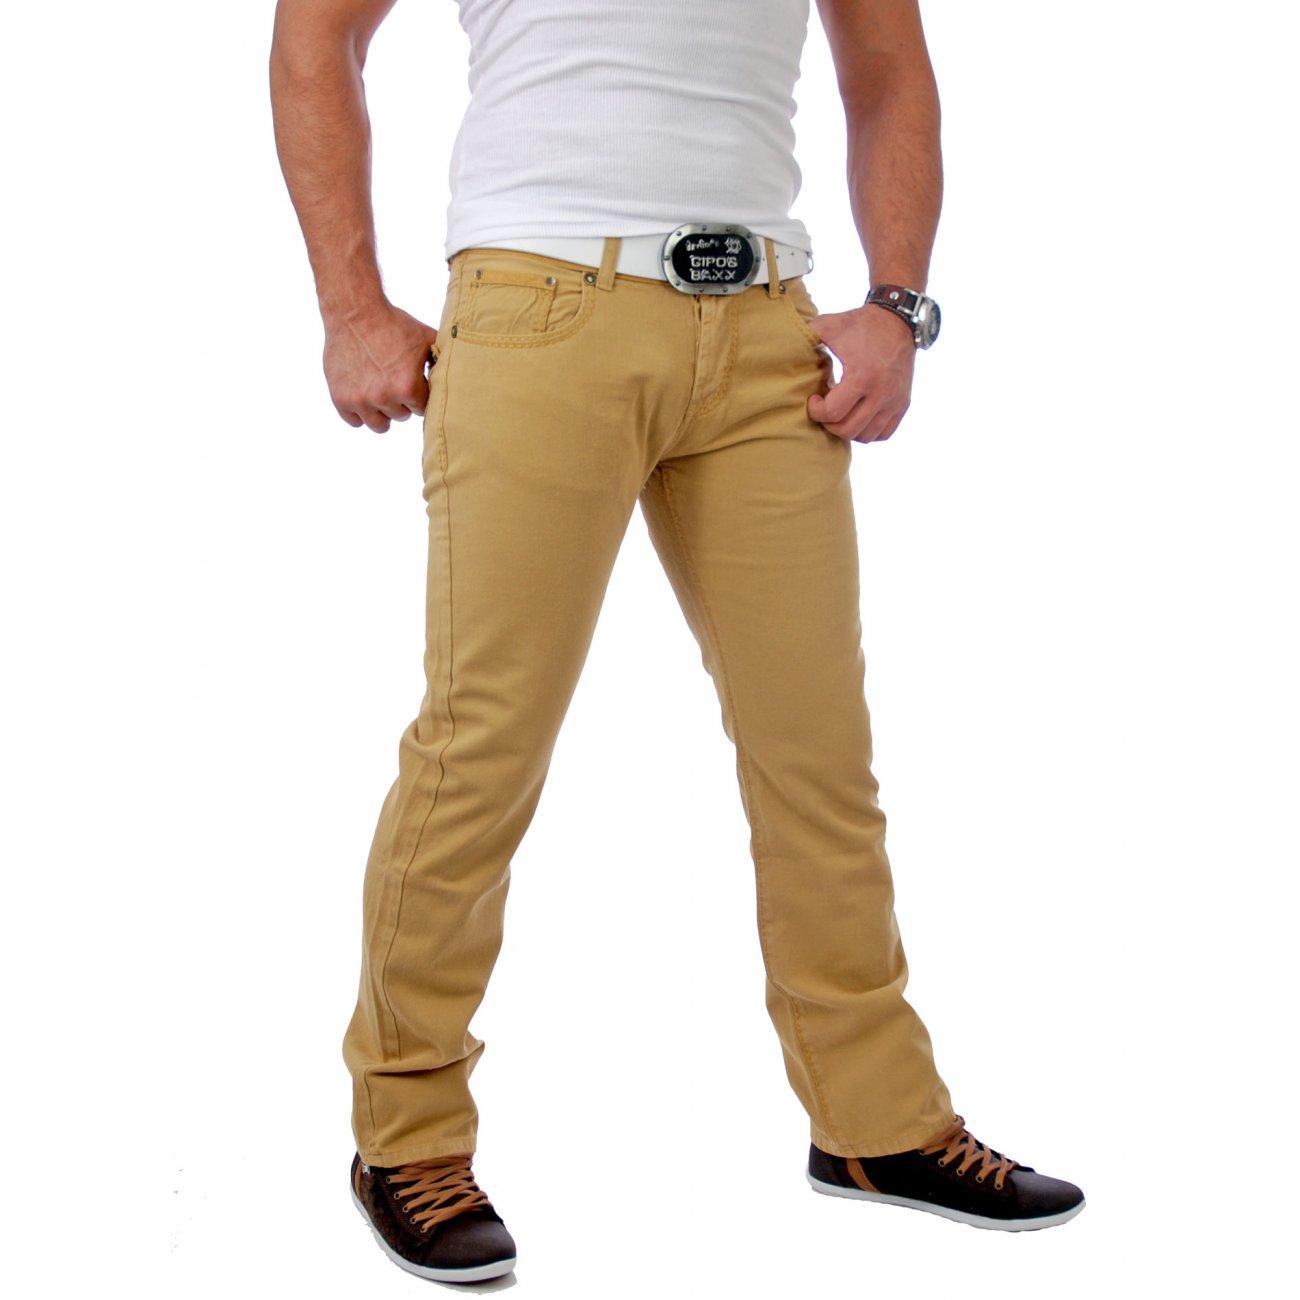 herren jeans curry tazzio 5100 jeans herren g nstig. Black Bedroom Furniture Sets. Home Design Ideas